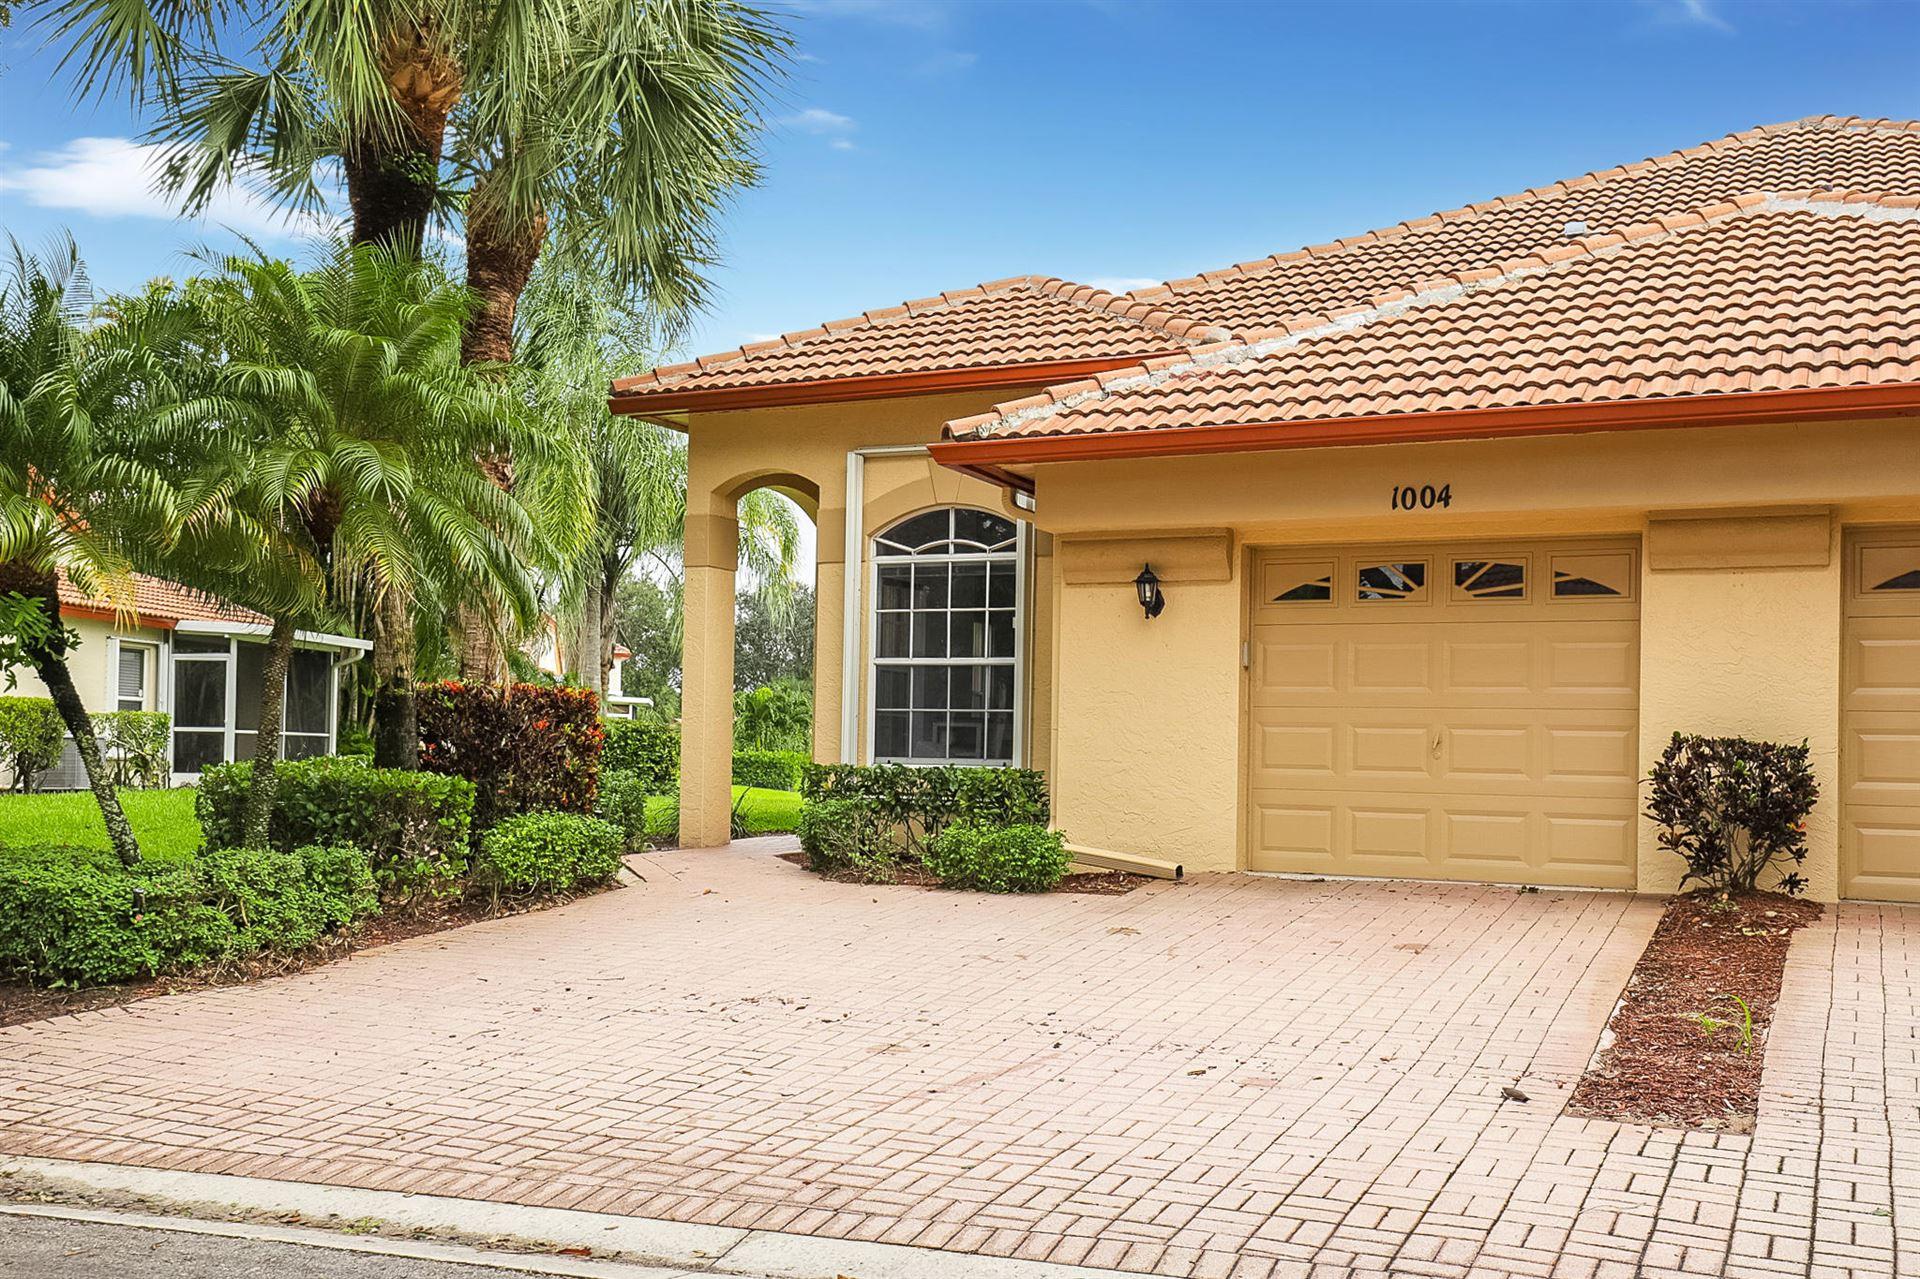 1004 Via Jardin, Riviera Beach, FL 33418 - #: RX-10670542